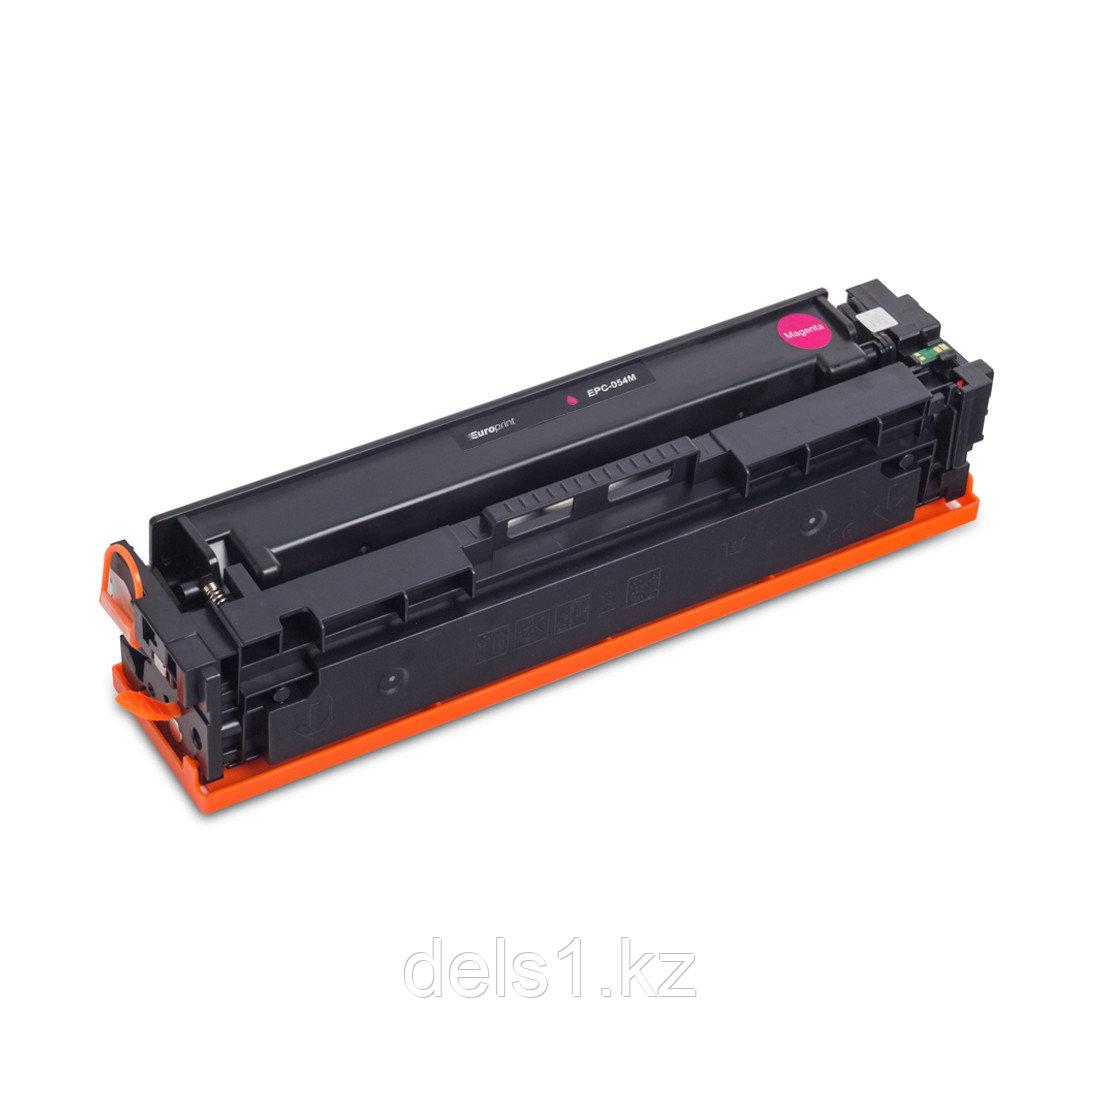 Картридж Europrint EPC-054M, Пурпурный, Для принтеров Canon imageCLASS MF640c/MF641CW/MF642CDW